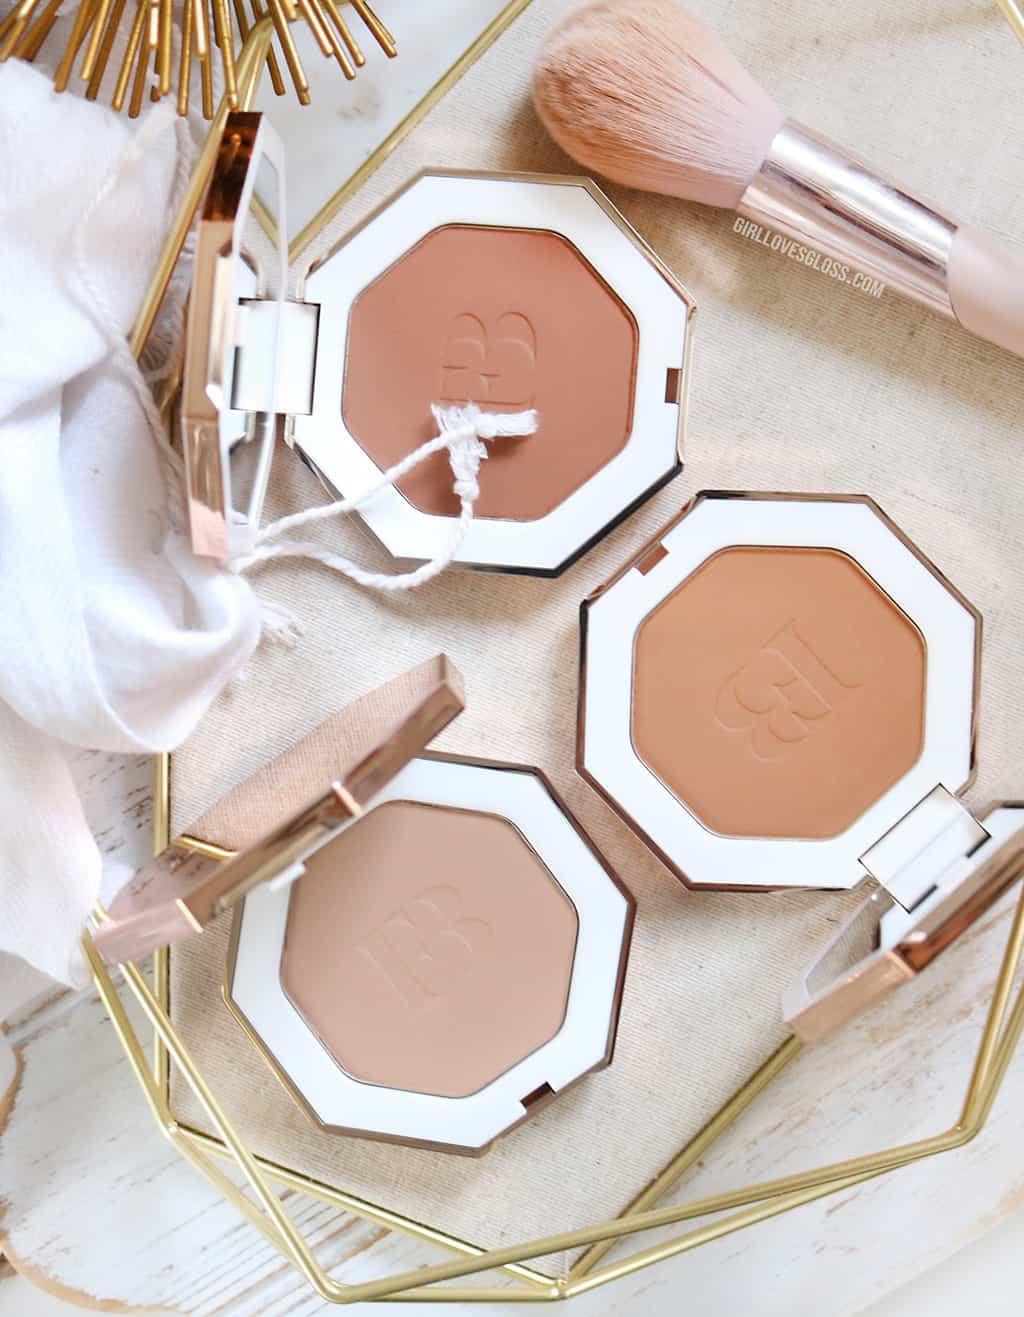 Fenty Beauty's New Sun Stalk'r Bronzers | Hit or Miss?